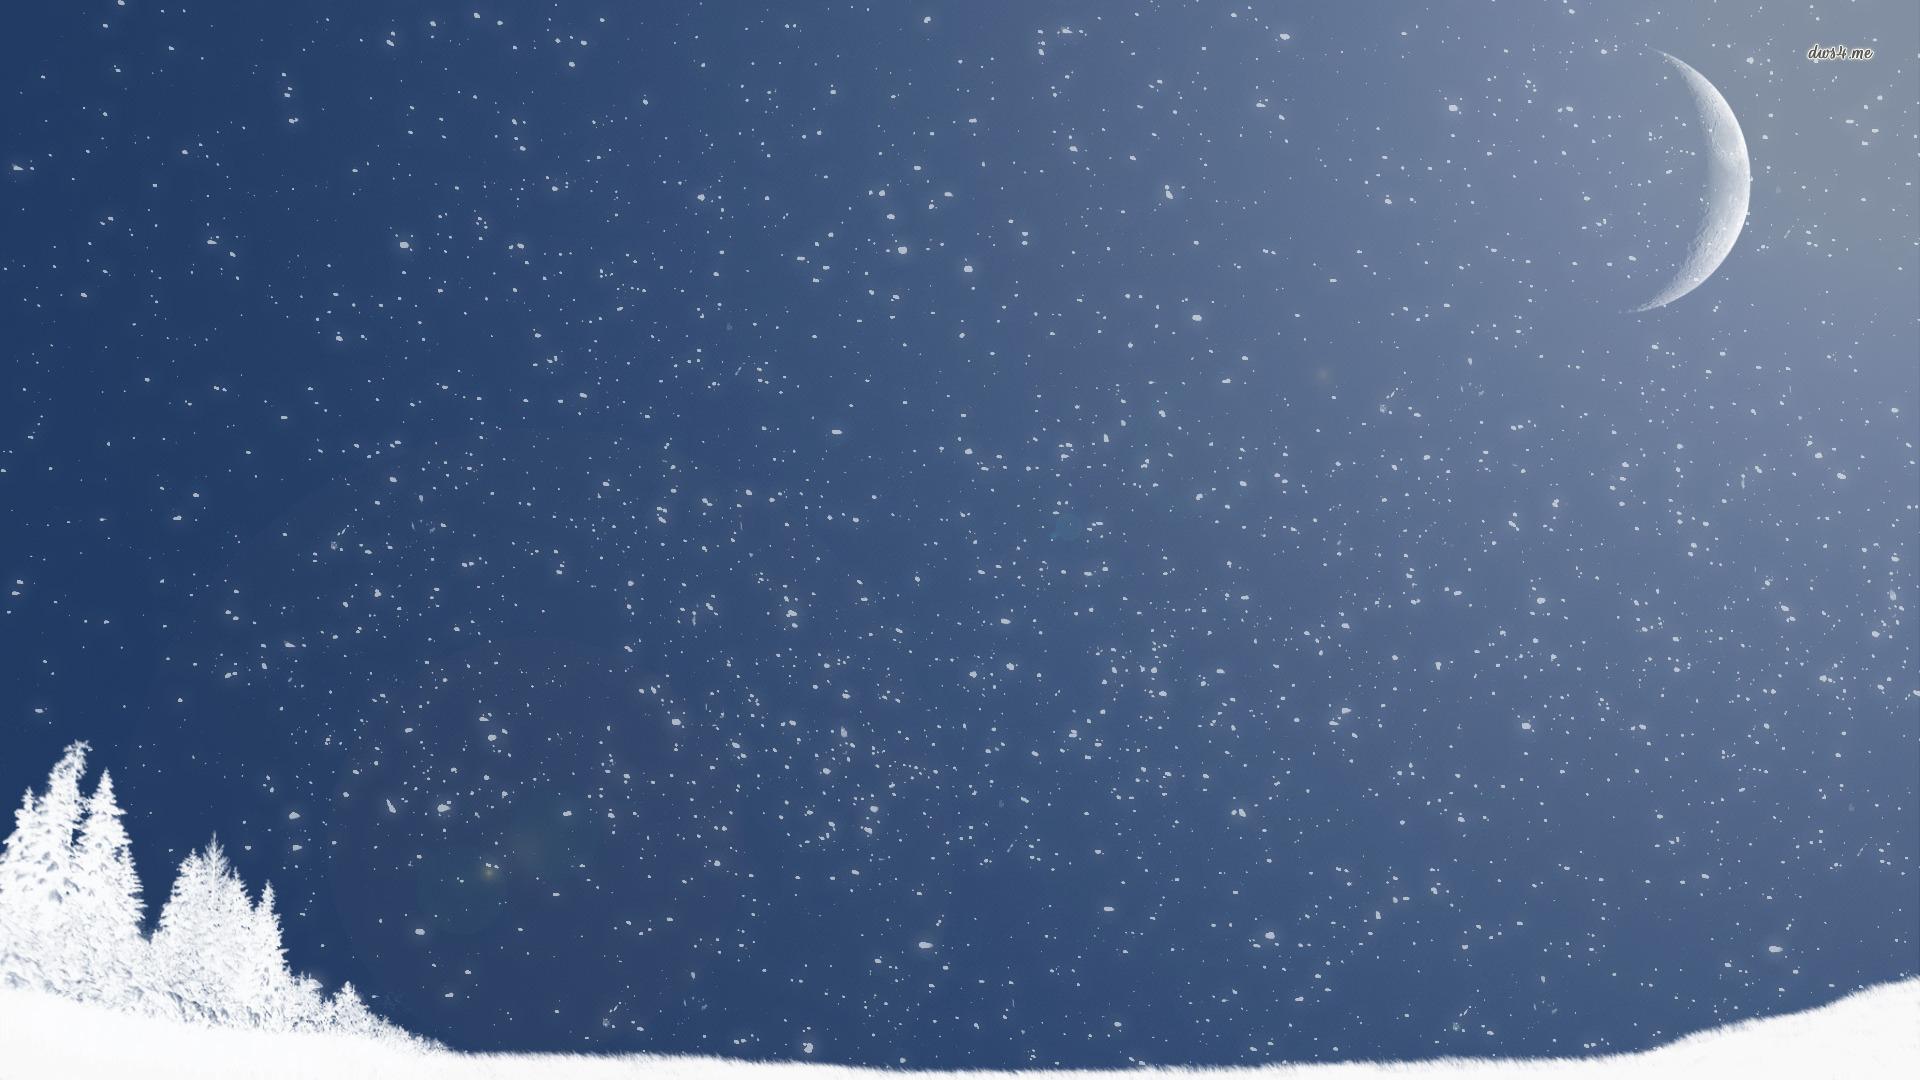 1920x1080 Snowfall Wallpaper